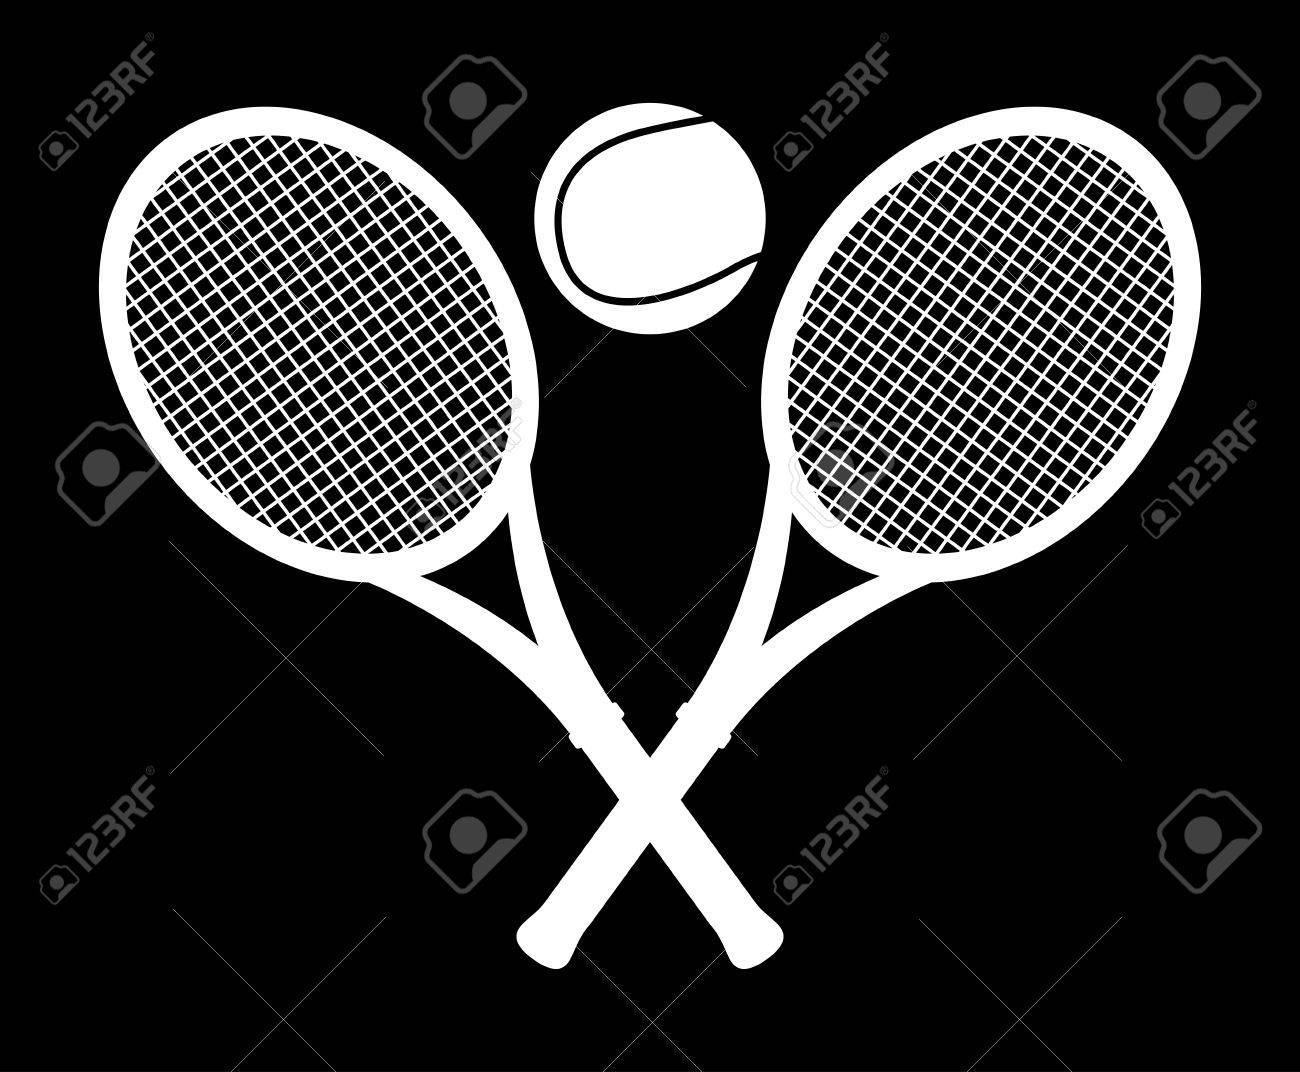 monochrome tennis design over black background illustration Stock Vector - 19772715